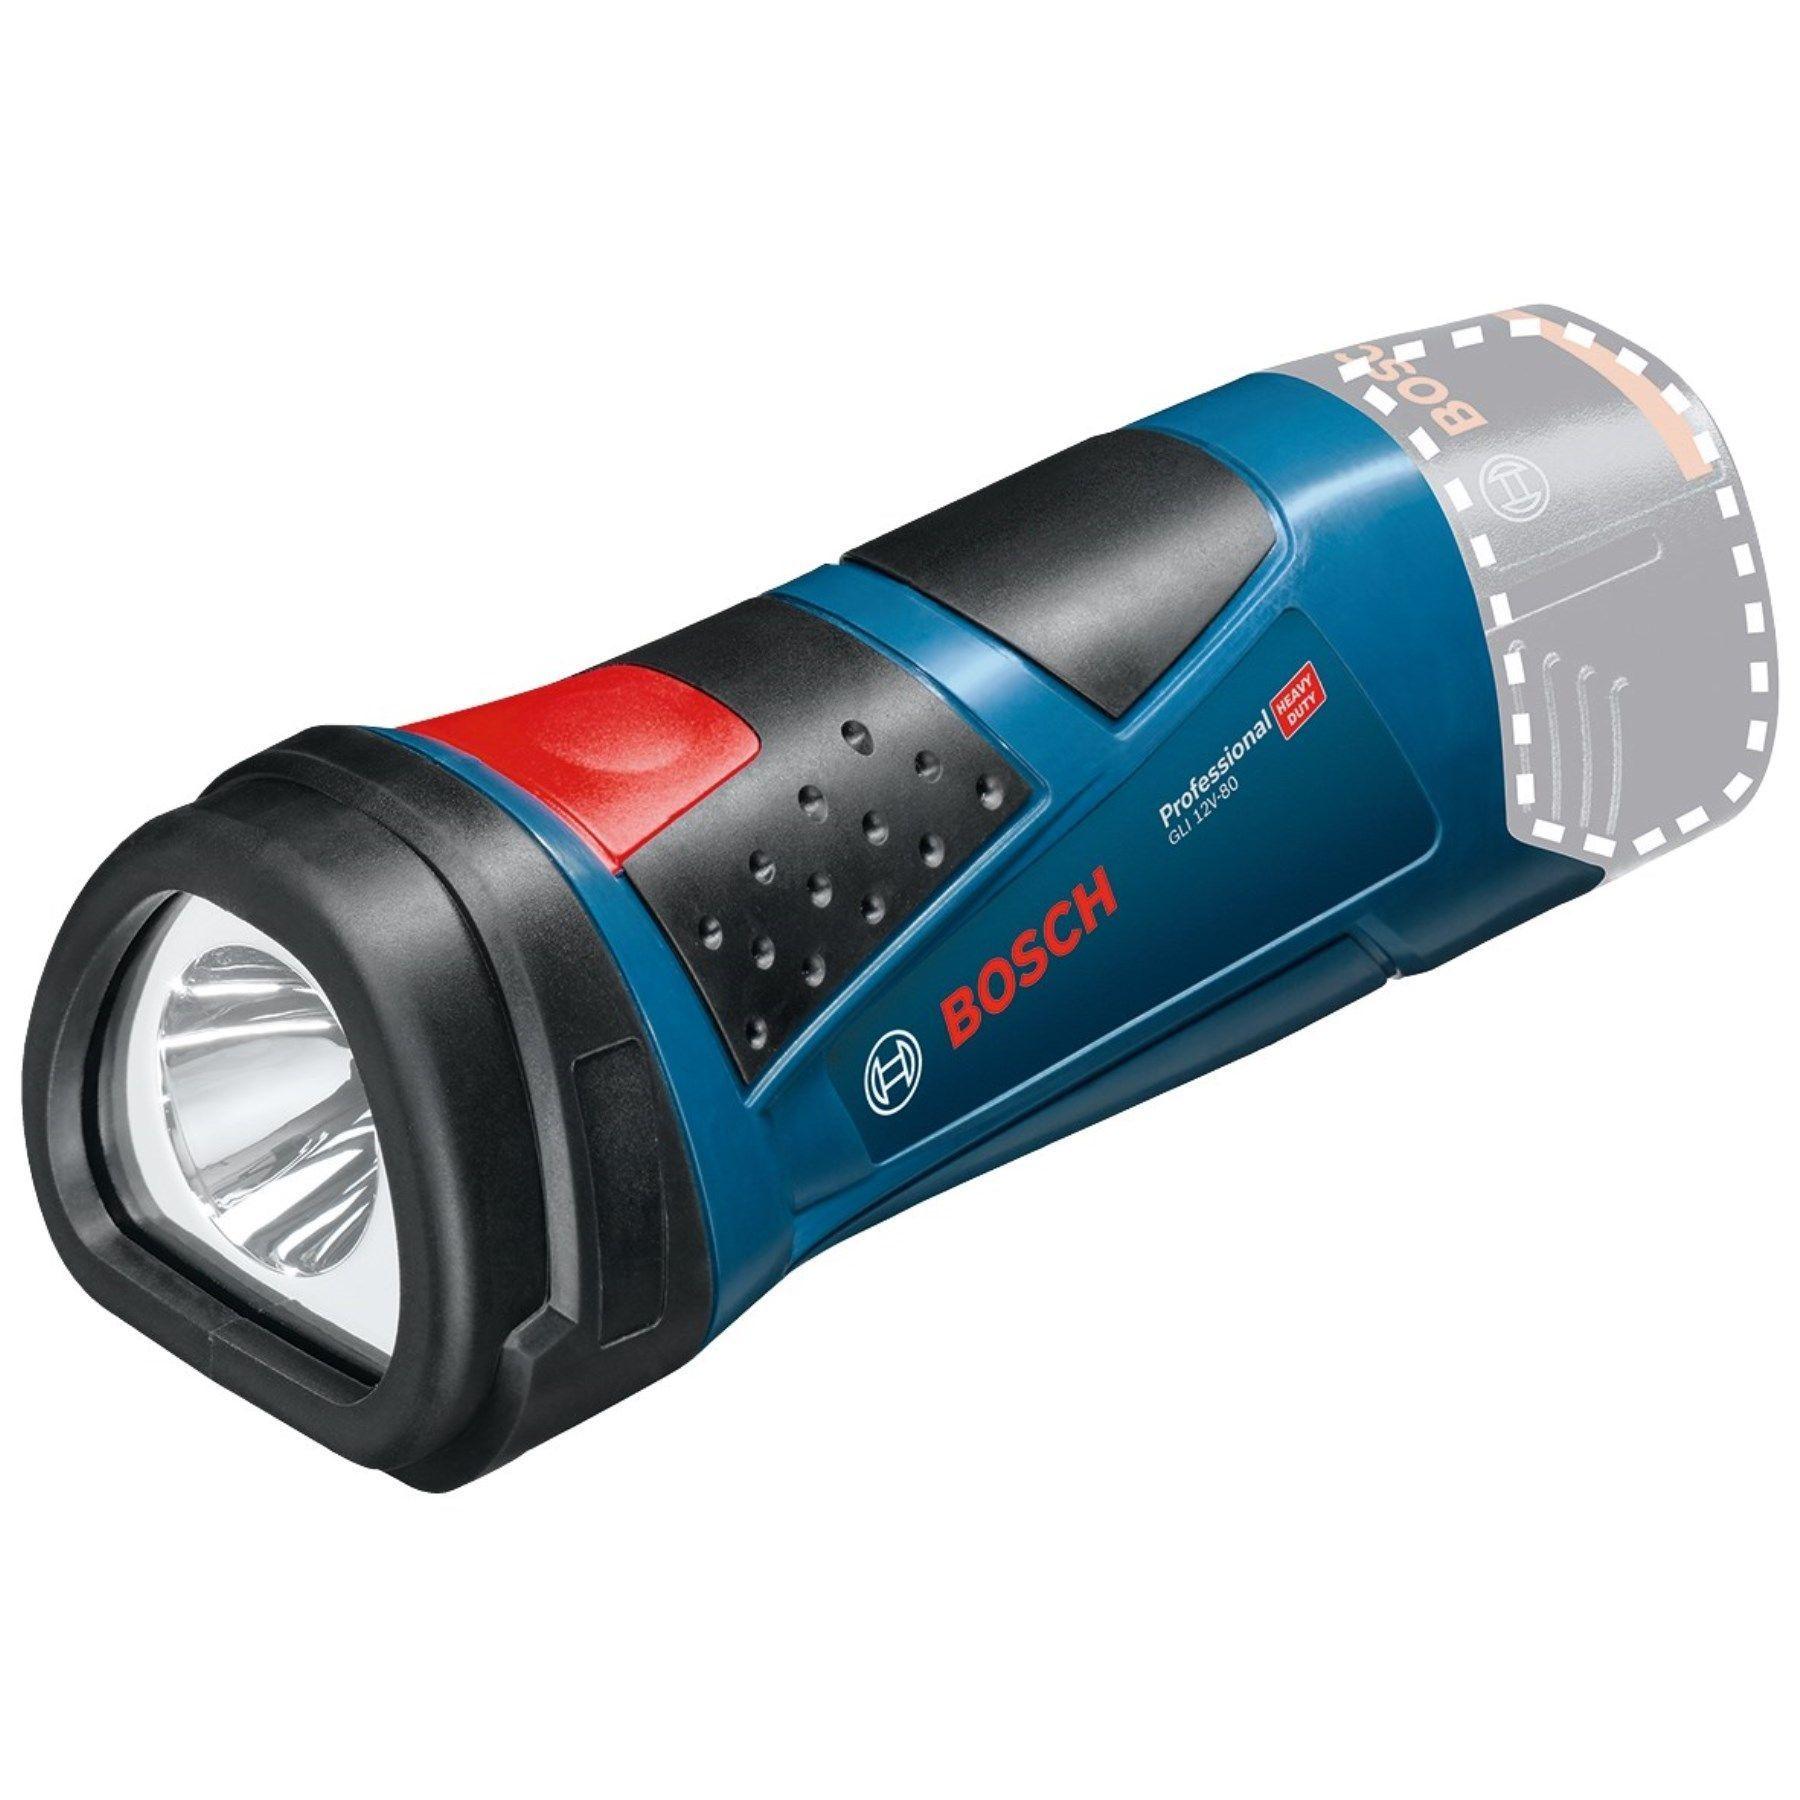 15 Akku Fur Lampe Hauptbeleuchtung Hausdekoration101 Com Akku Fur Hauptbeleuchtung In 2020 Bosch Bosch Tools Led Flashlight